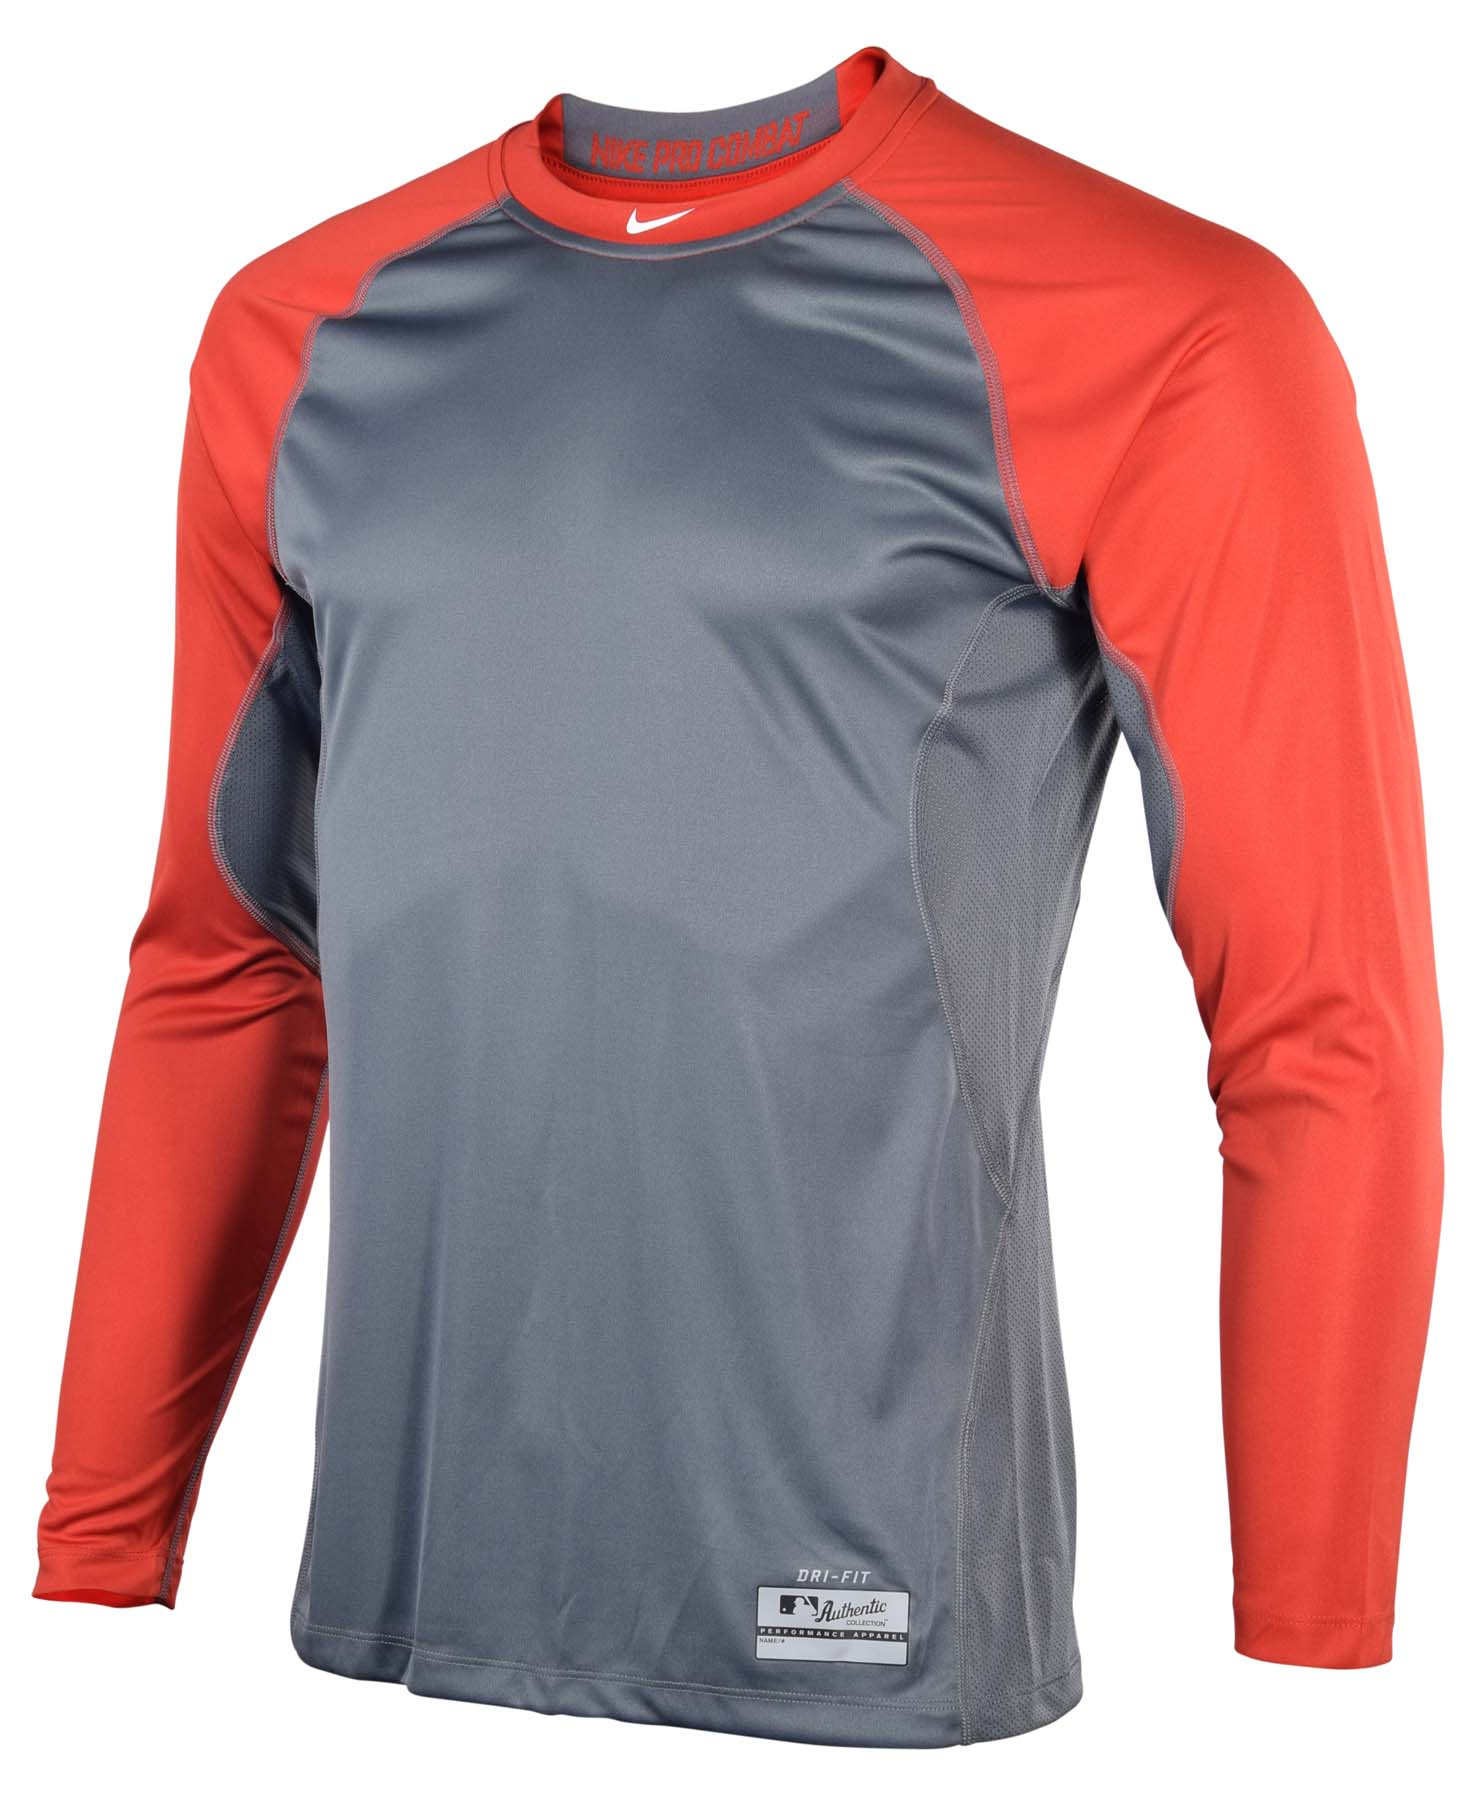 bb6e3eca139 Nike Pro Combat Core Fitted Long Sleeve Shirt